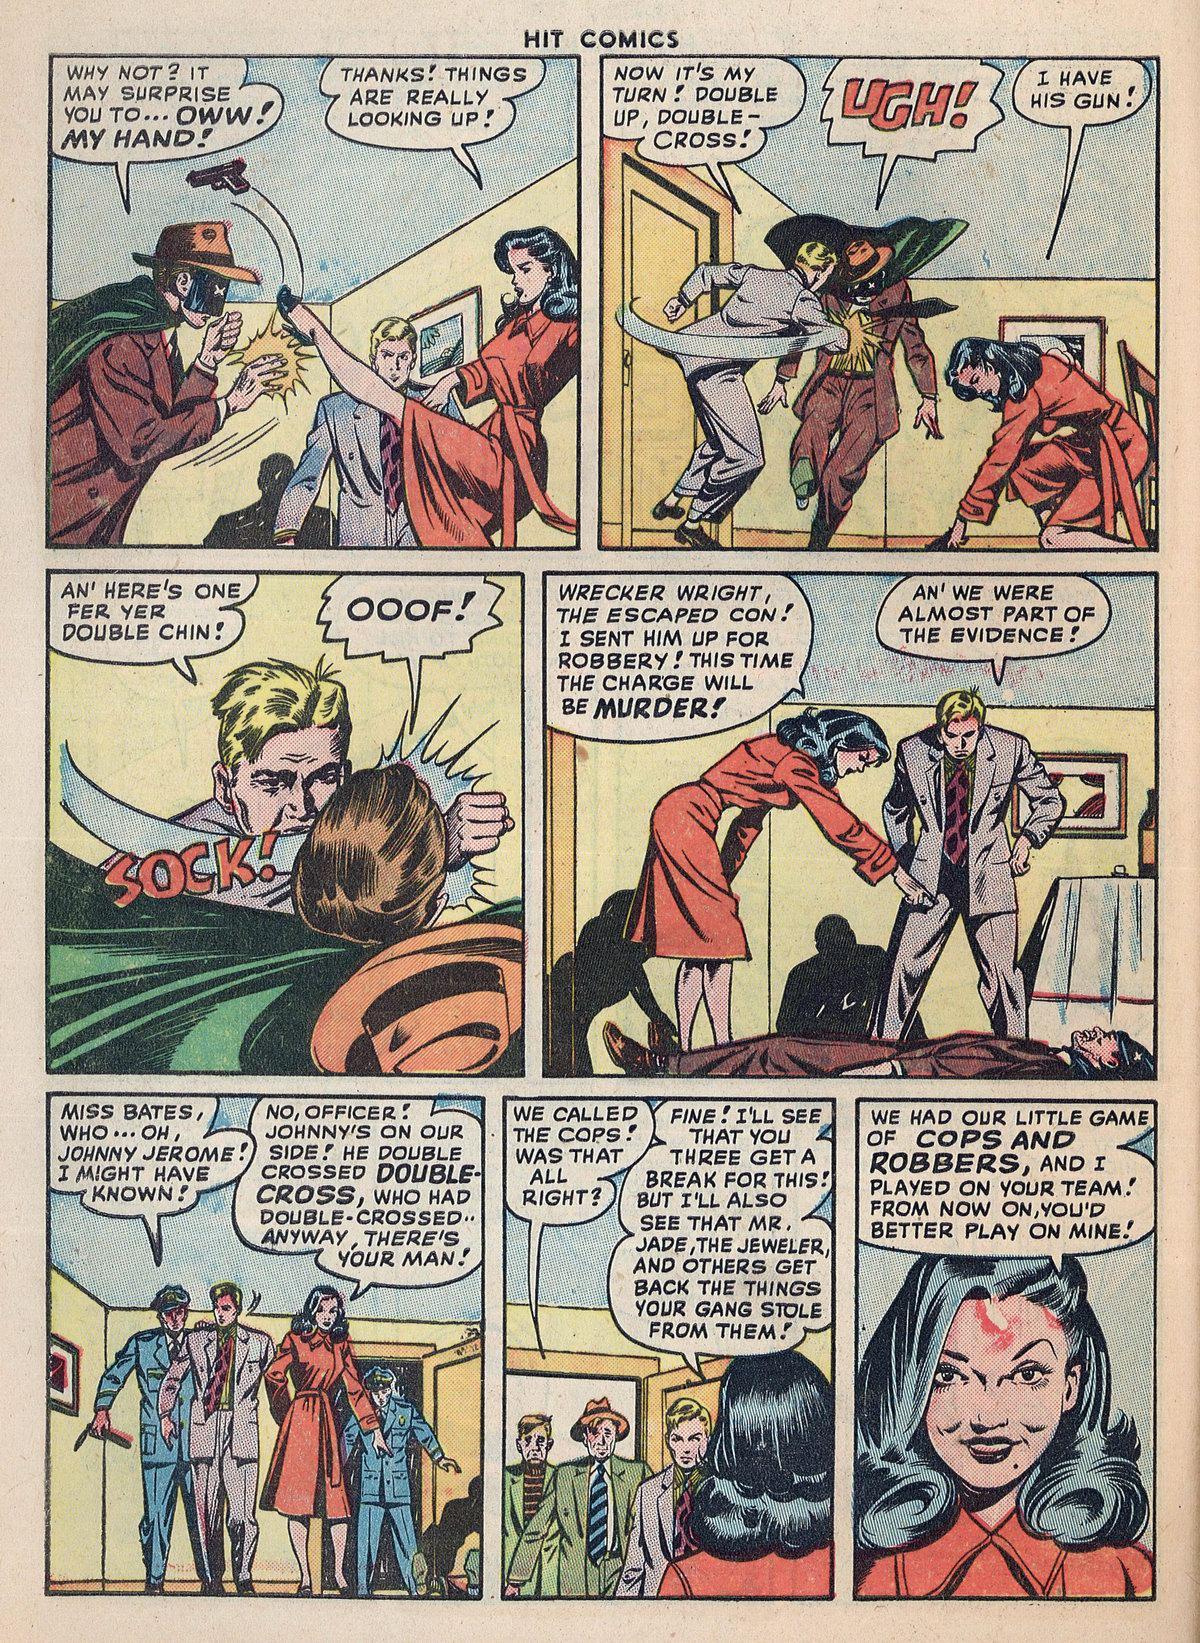 Read online Hit Comics comic -  Issue #55 - 44